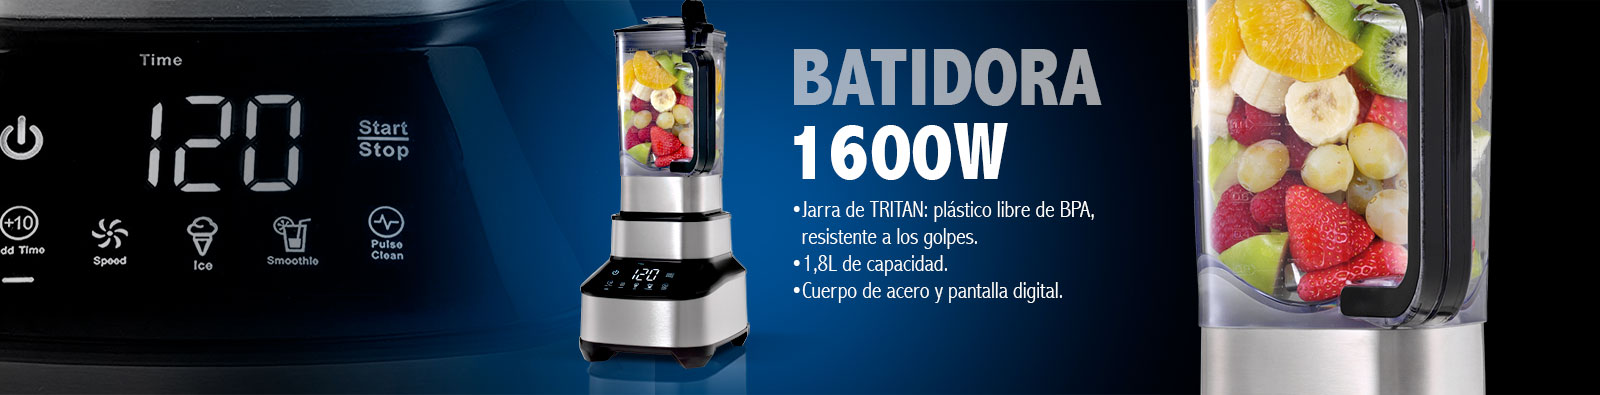 cabecera-batidora_1